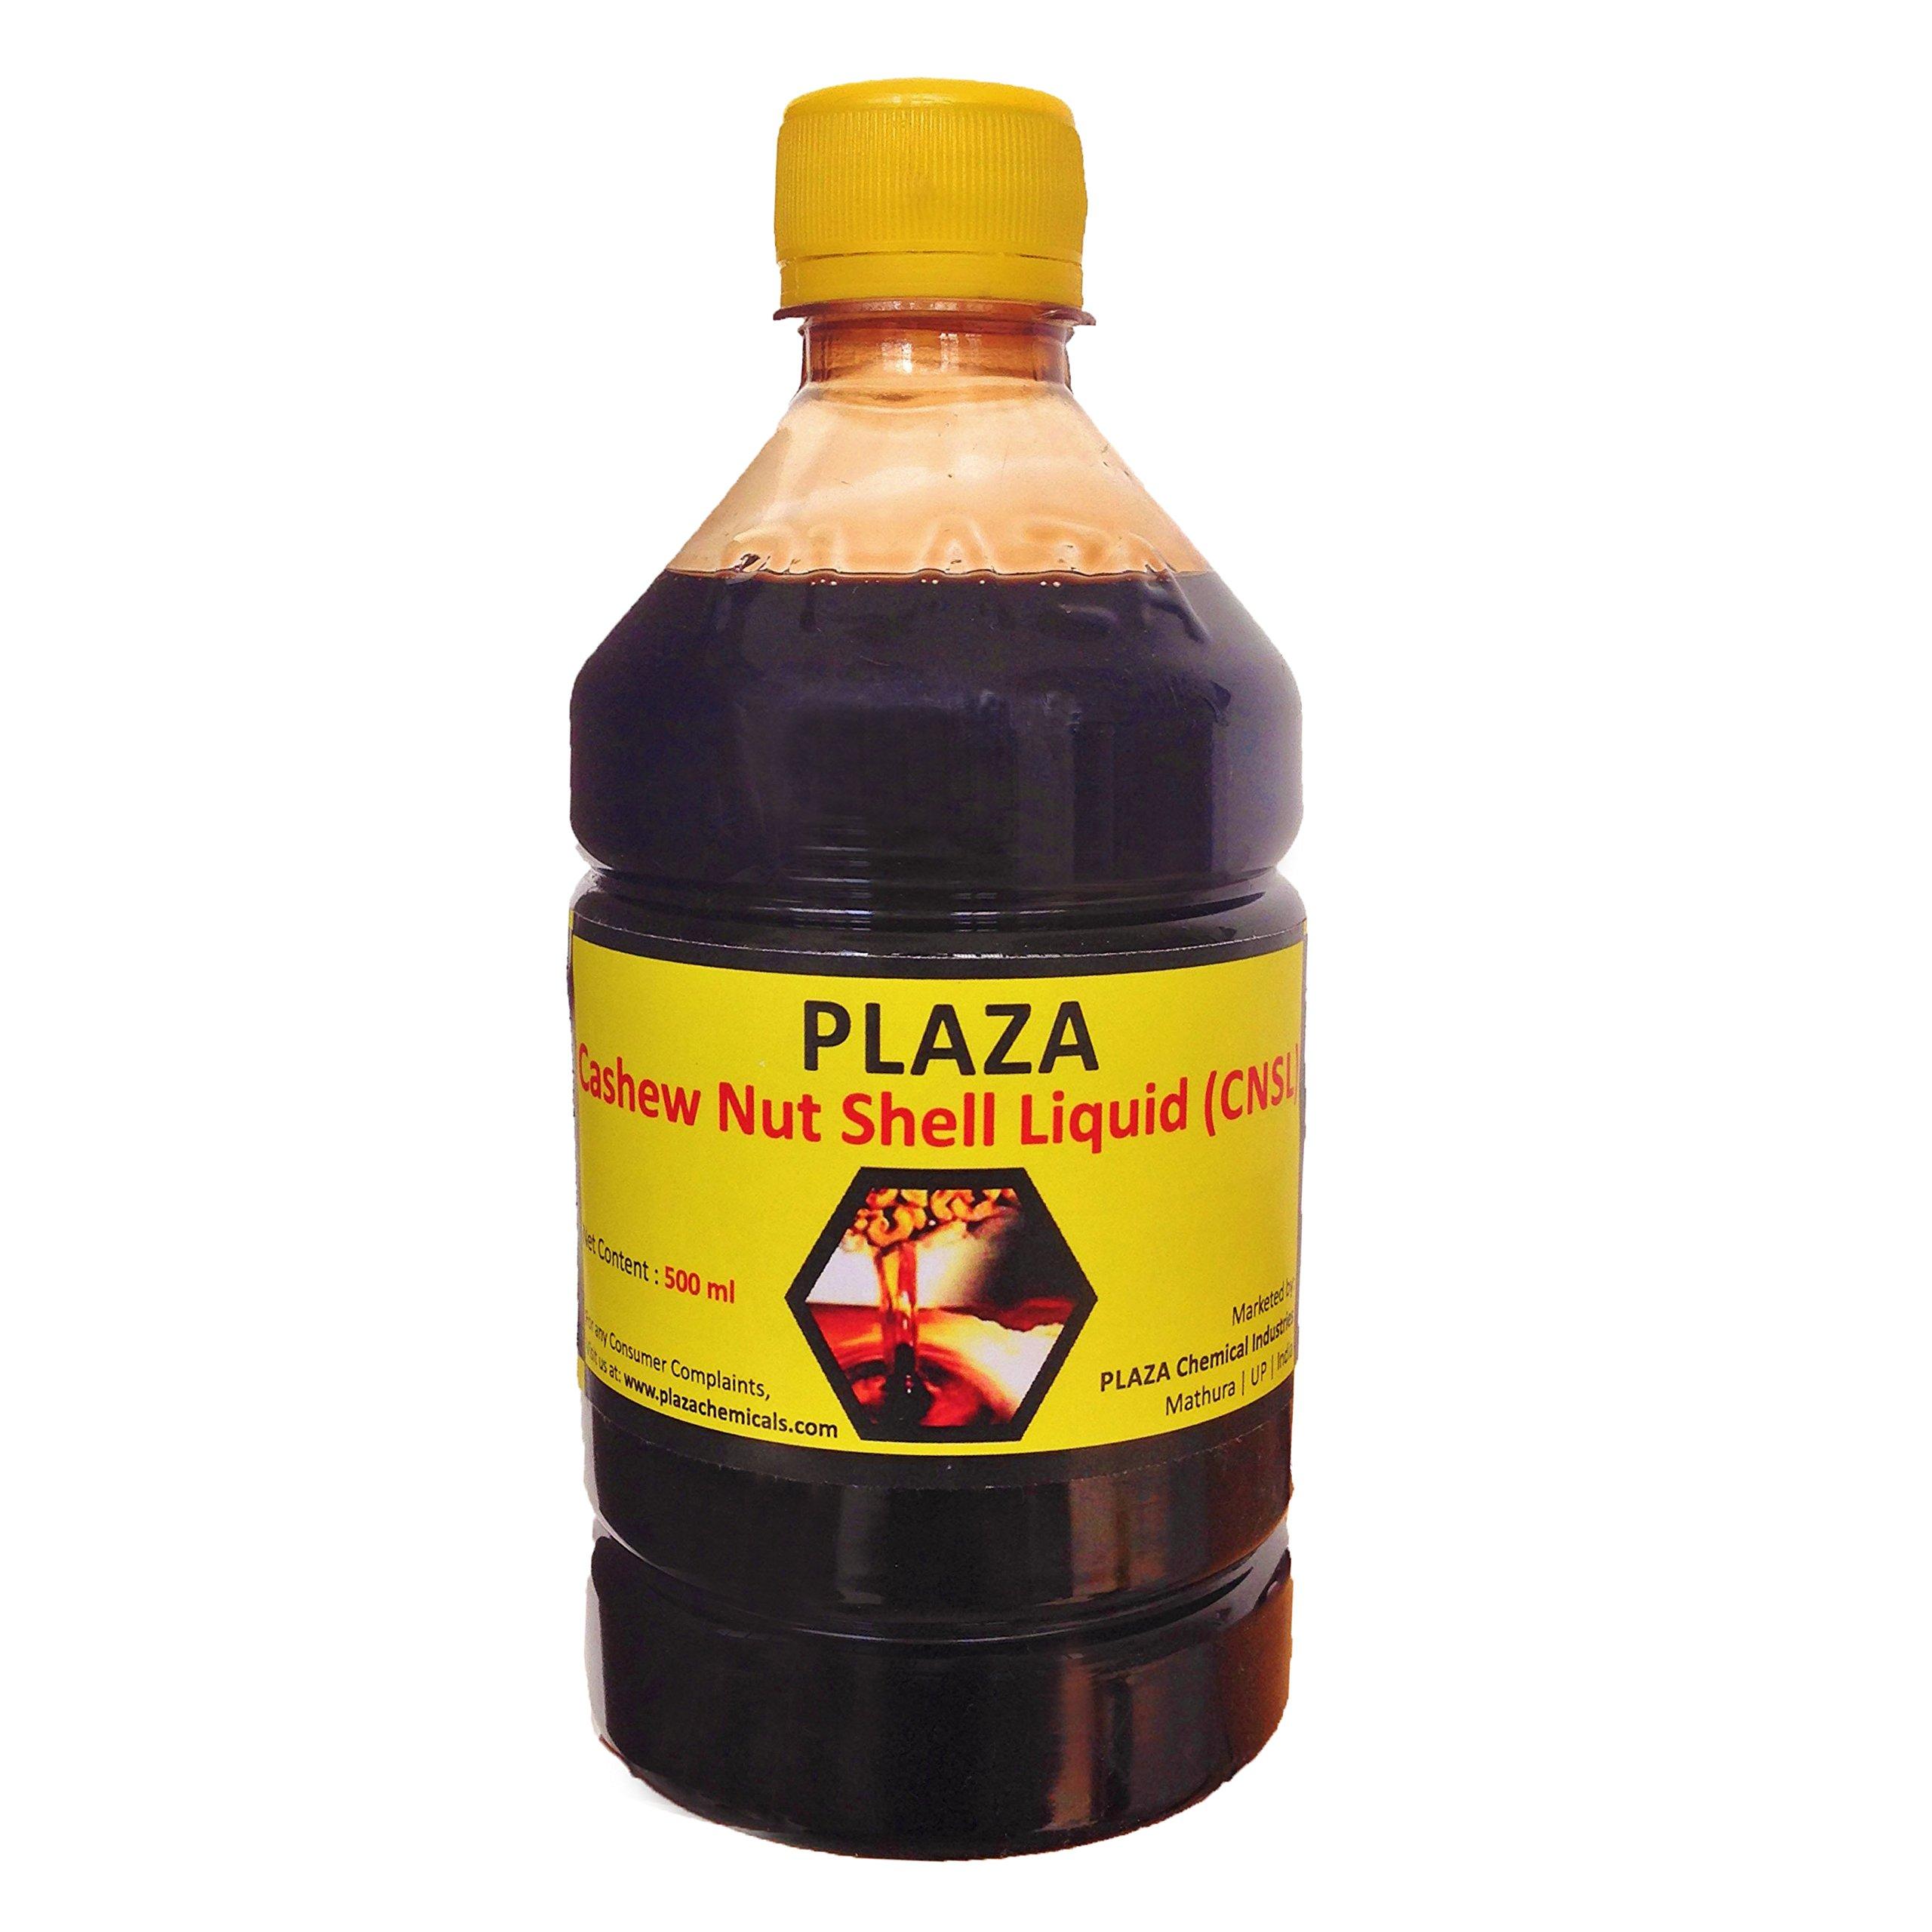 PLAZA - Cashew Nut Shell Liquid Oil (CNSL Oil) - 500 ml Pack